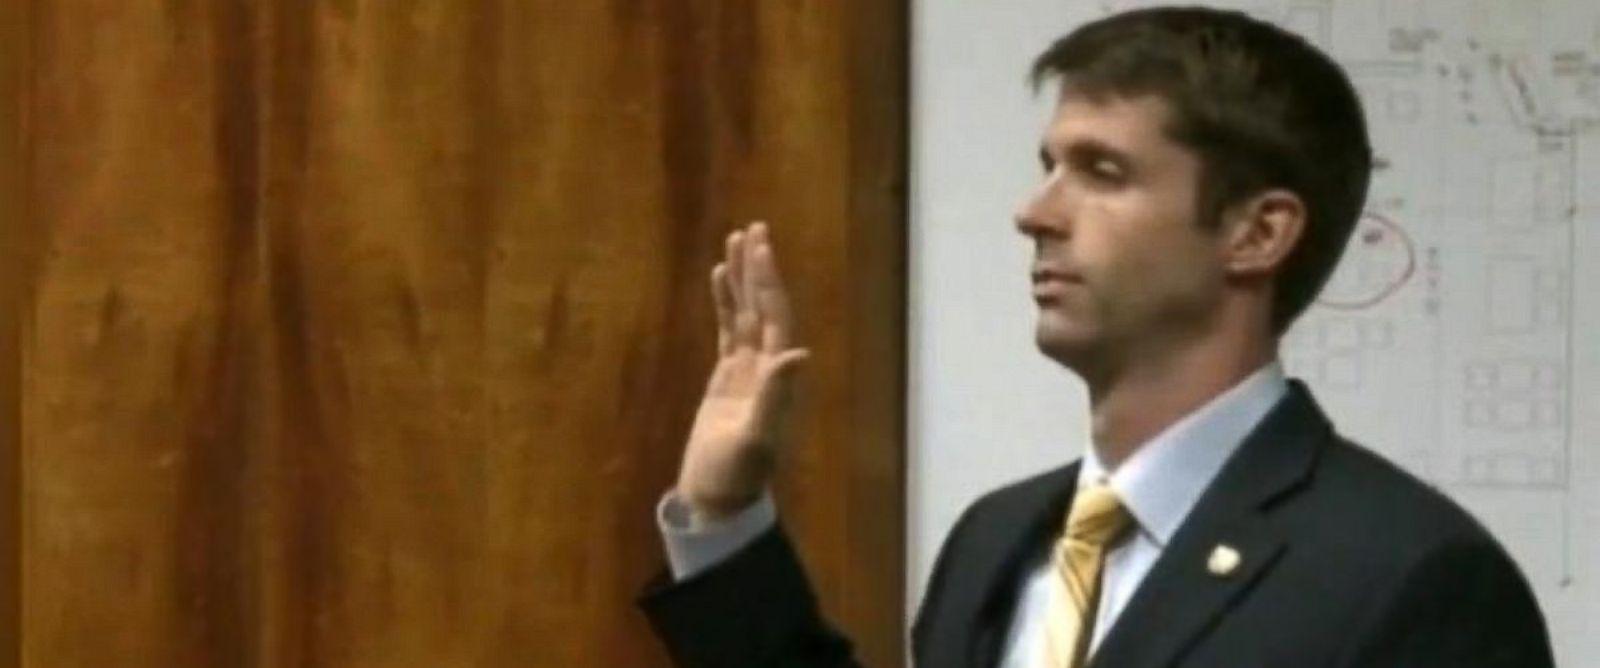 PHOTO: Christopher Deedy is accused of second degree murder in the November 5, 2011 death of Kollin Elderts, 23.